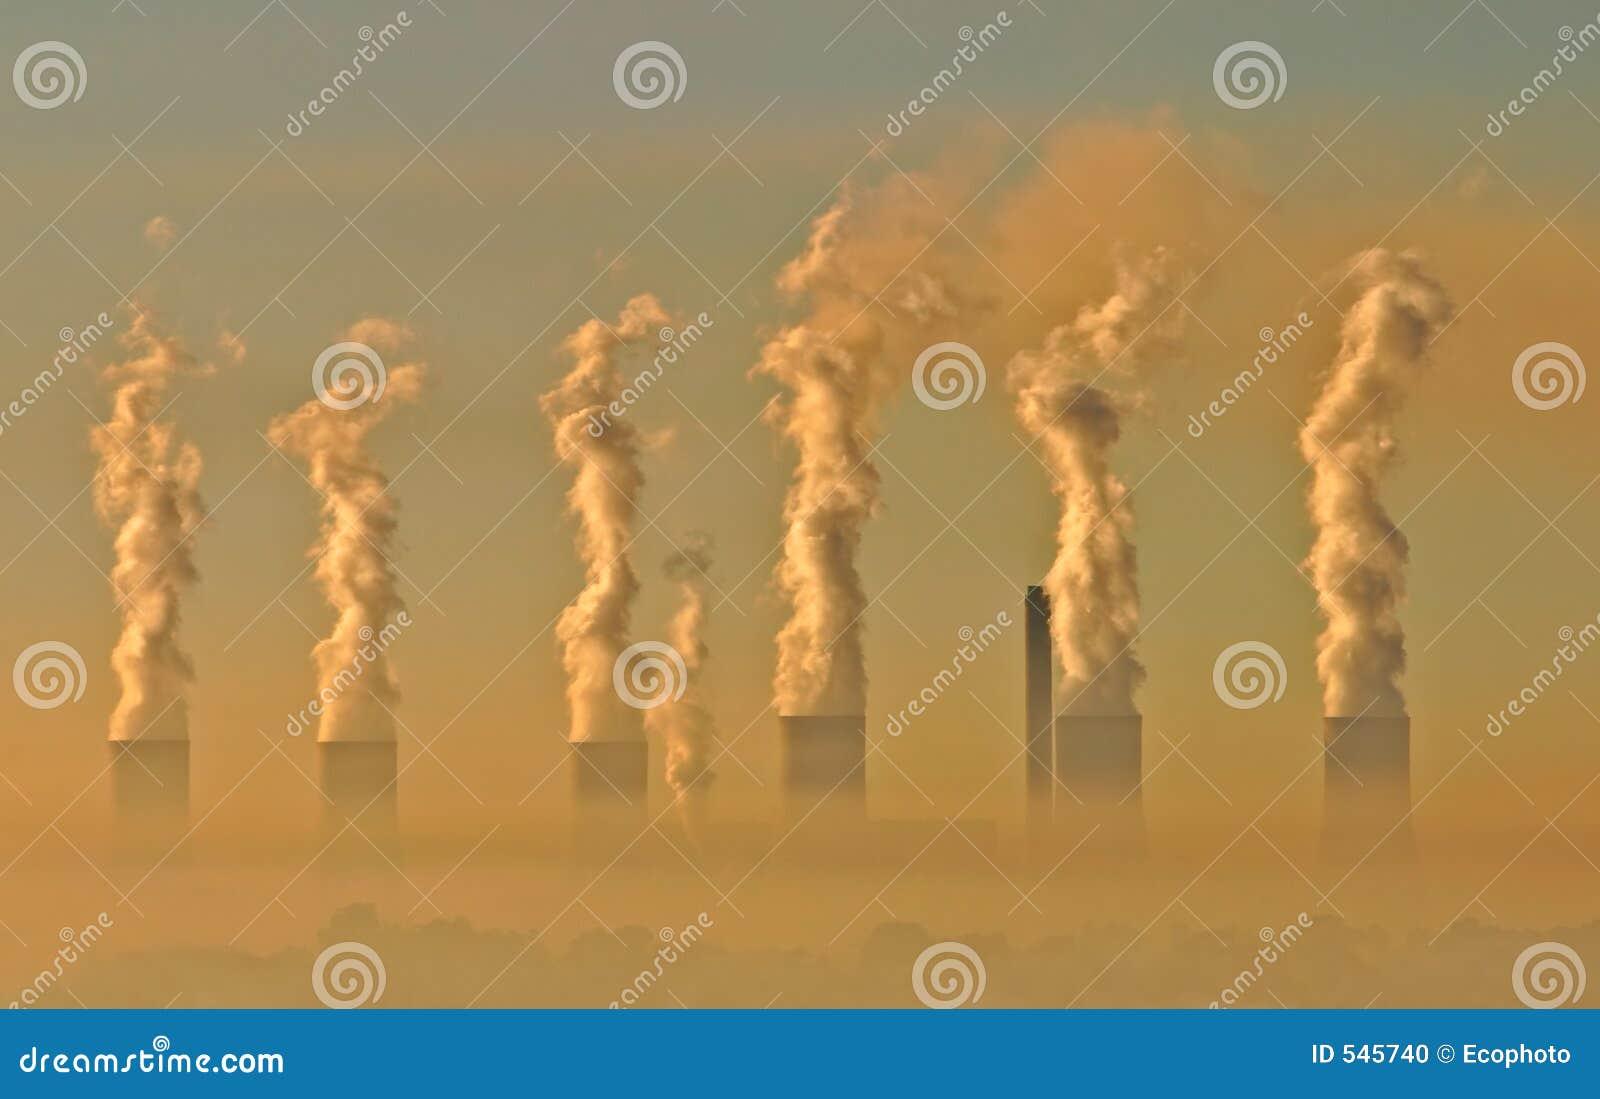 Brouillard enfumé industriel